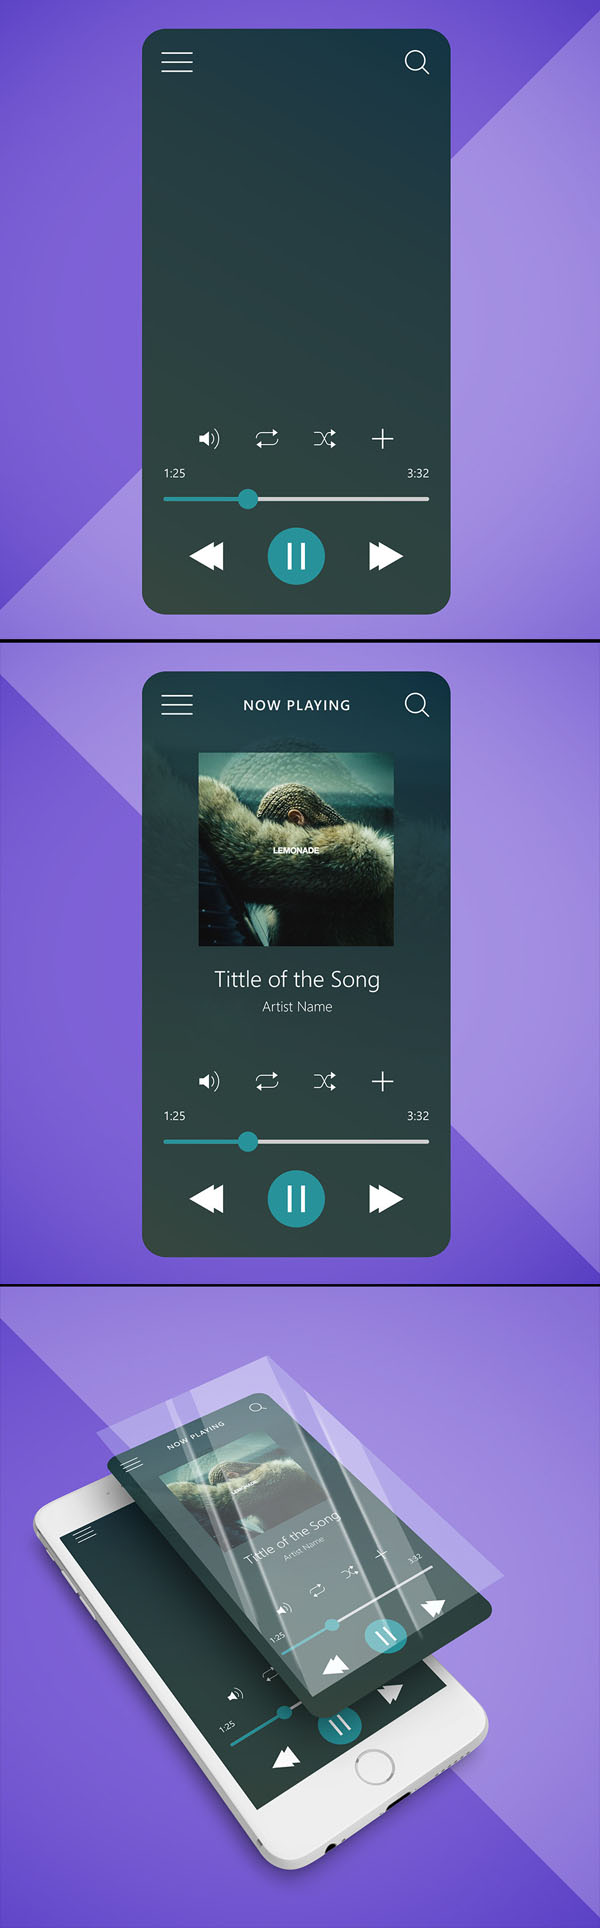 Music Player Interface - Free UI Mockup + Illustration